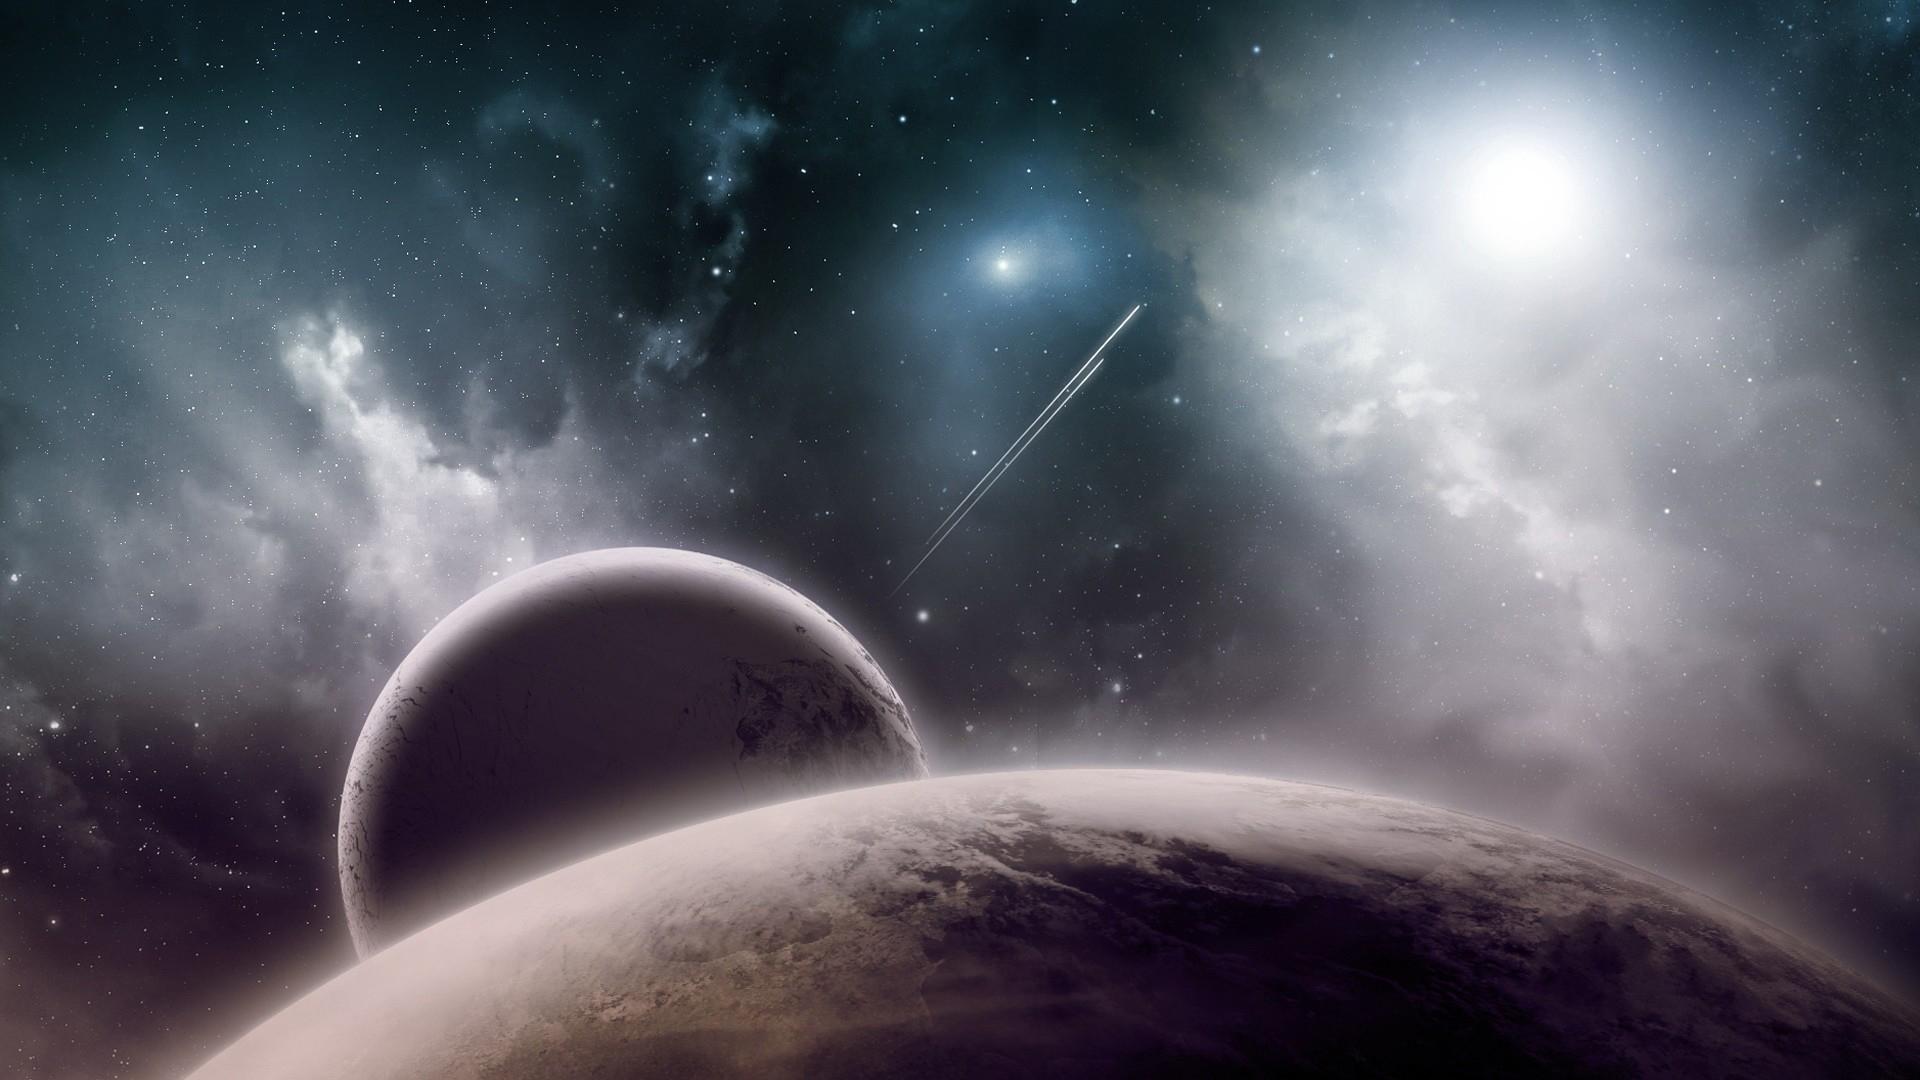 планеты, спутники, звезды